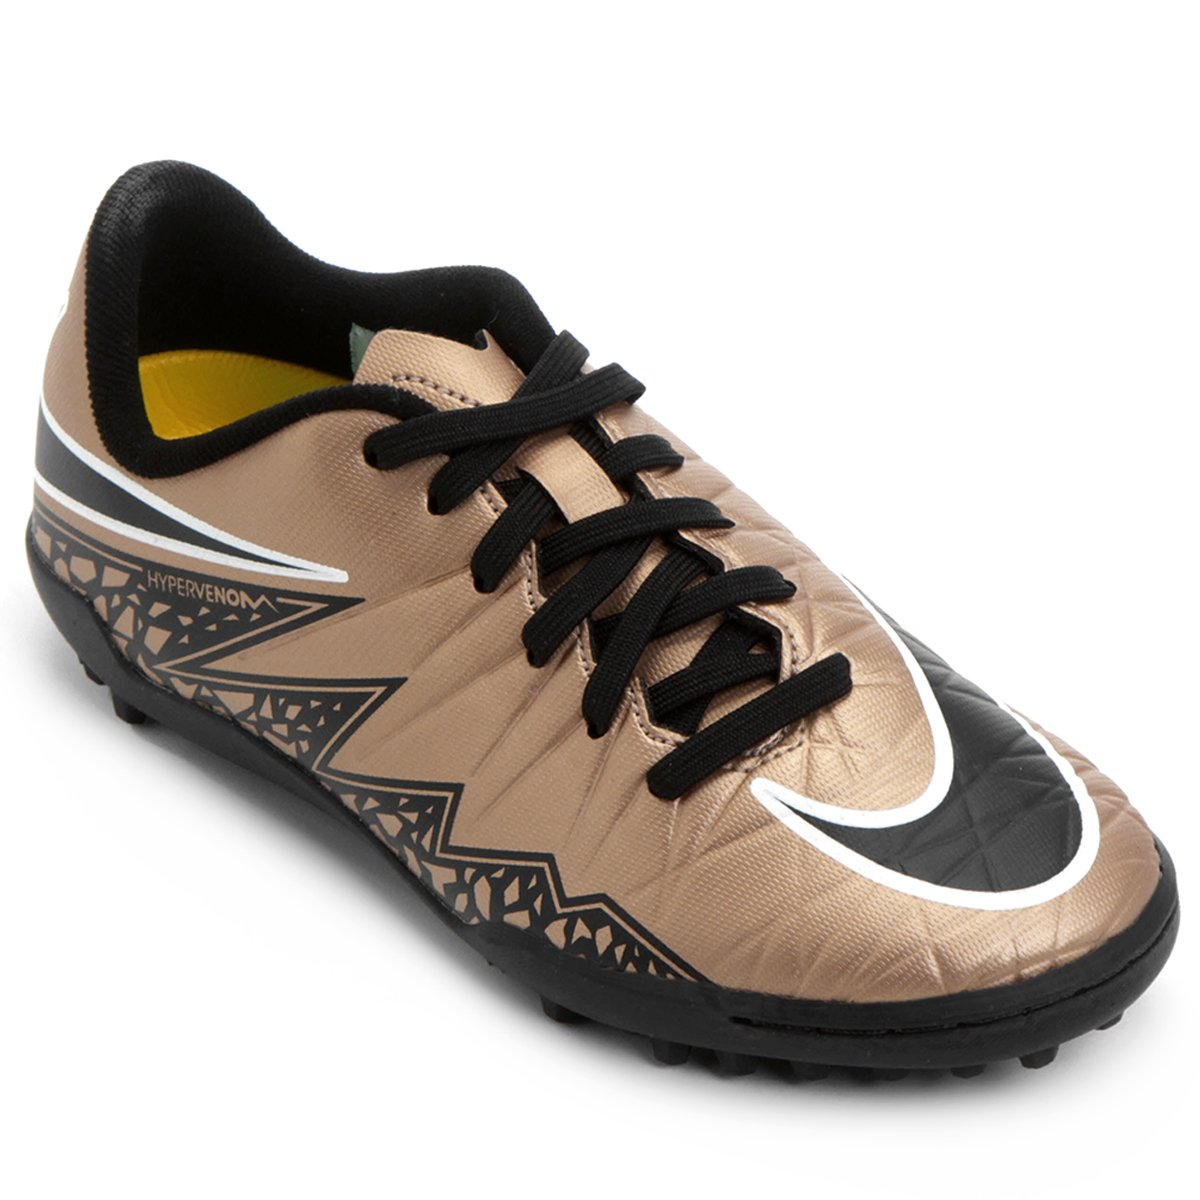 Chuteira Society Infantil Nike Hypervenom Phelon 2 TF - Compre Agora ... 3c37461877d6f